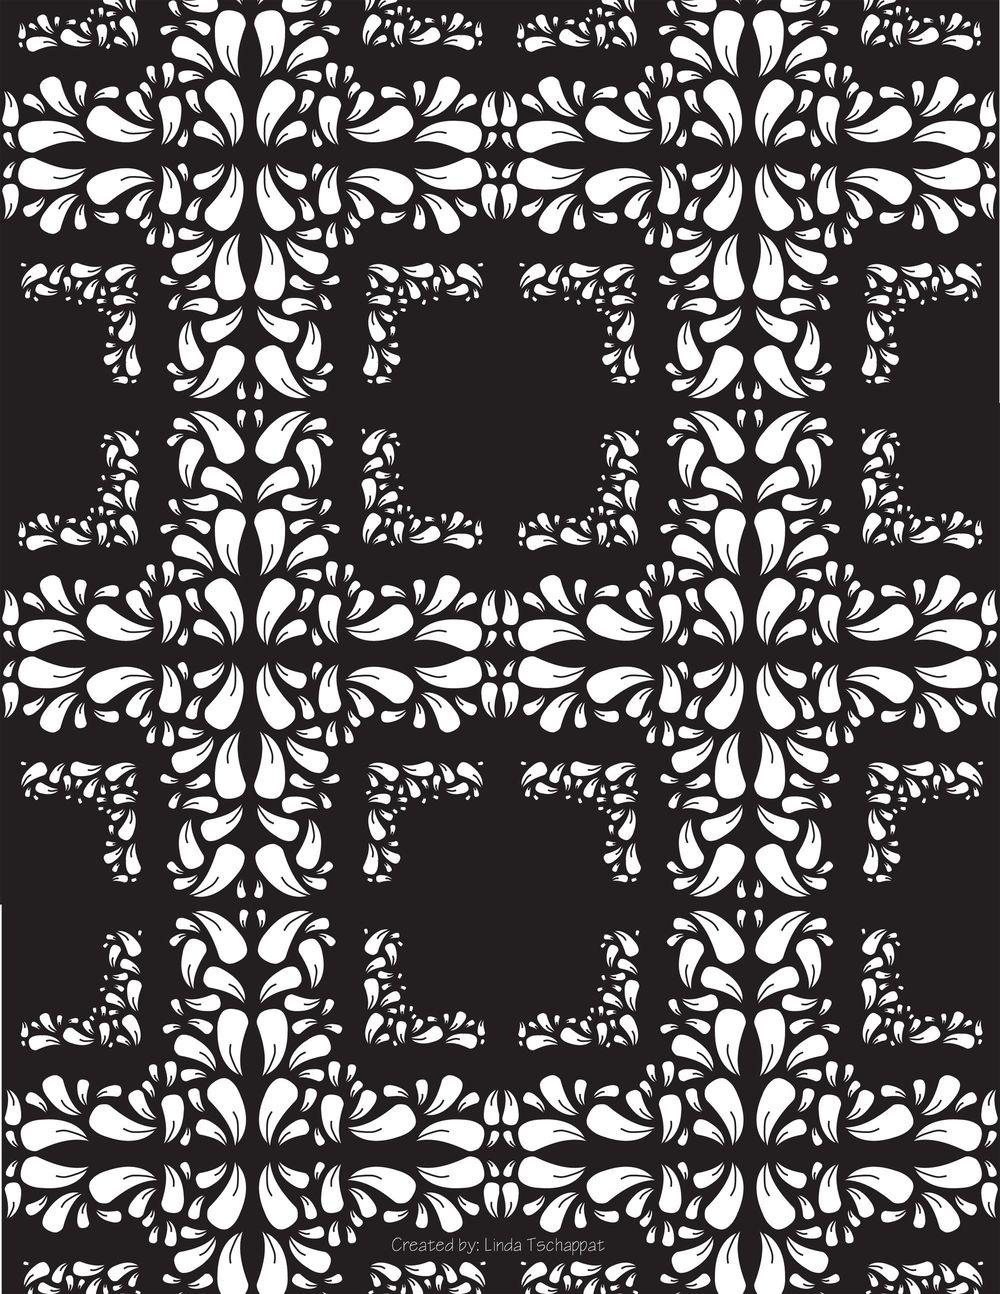 Damask Pattern - image 1 - student project